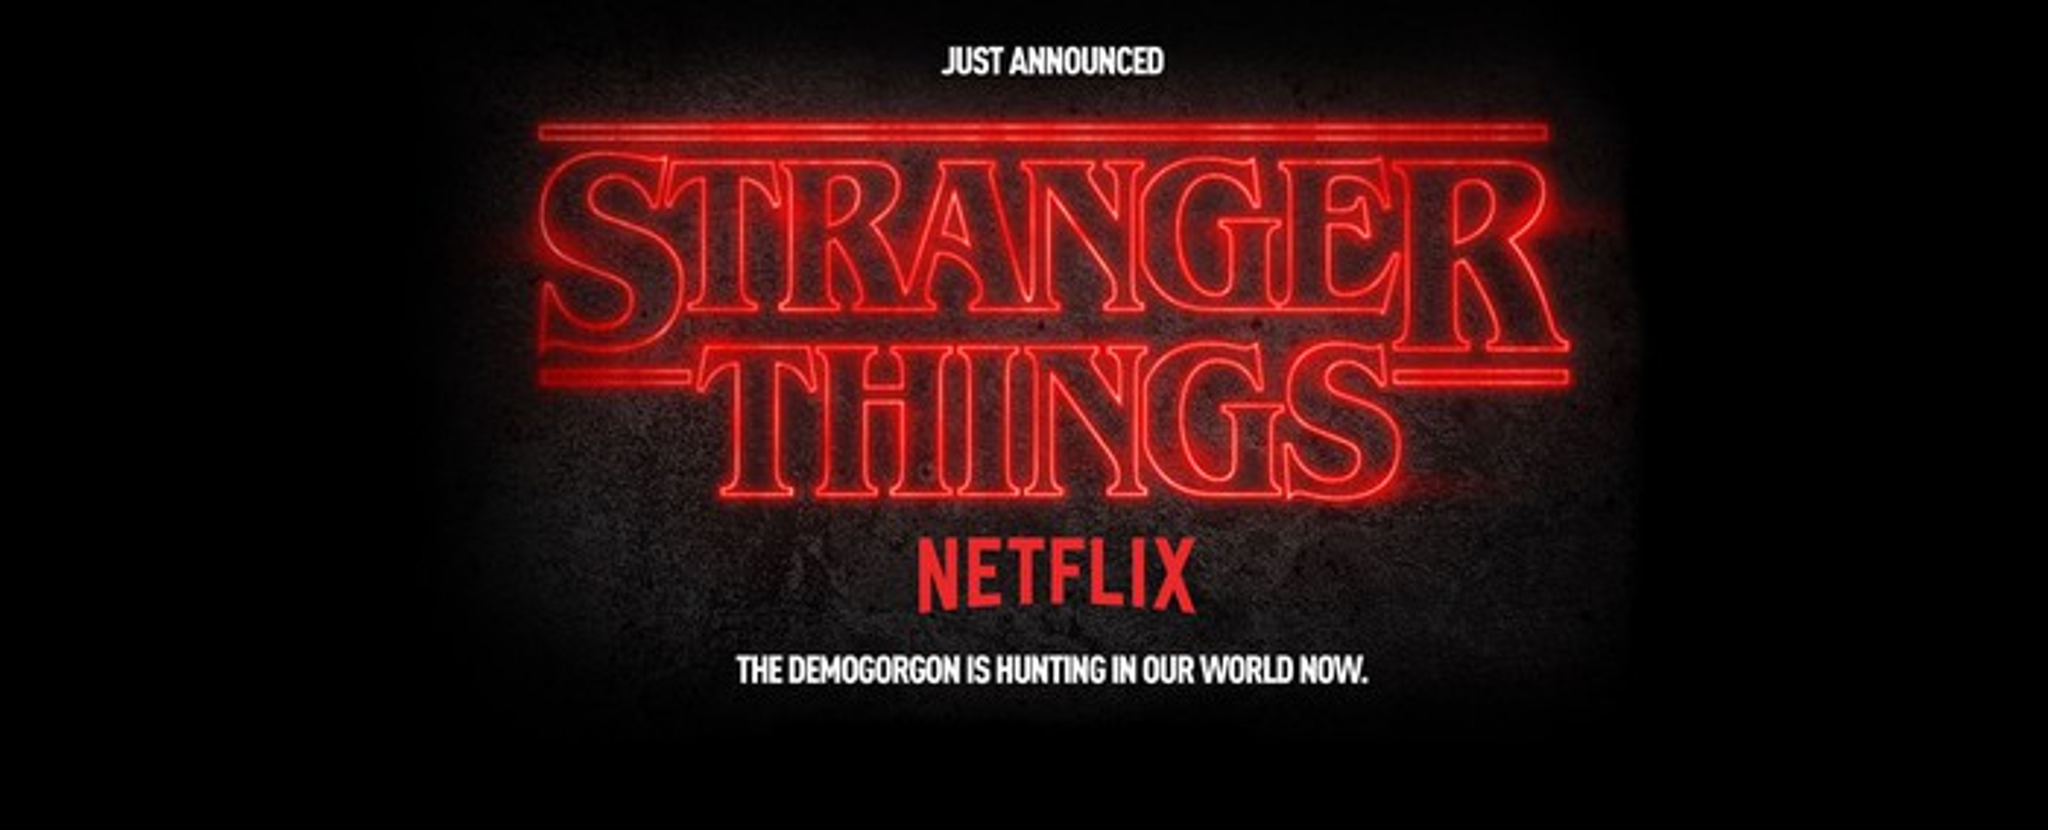 Universal's Halloween Horror Nights ad for Stranger Things.